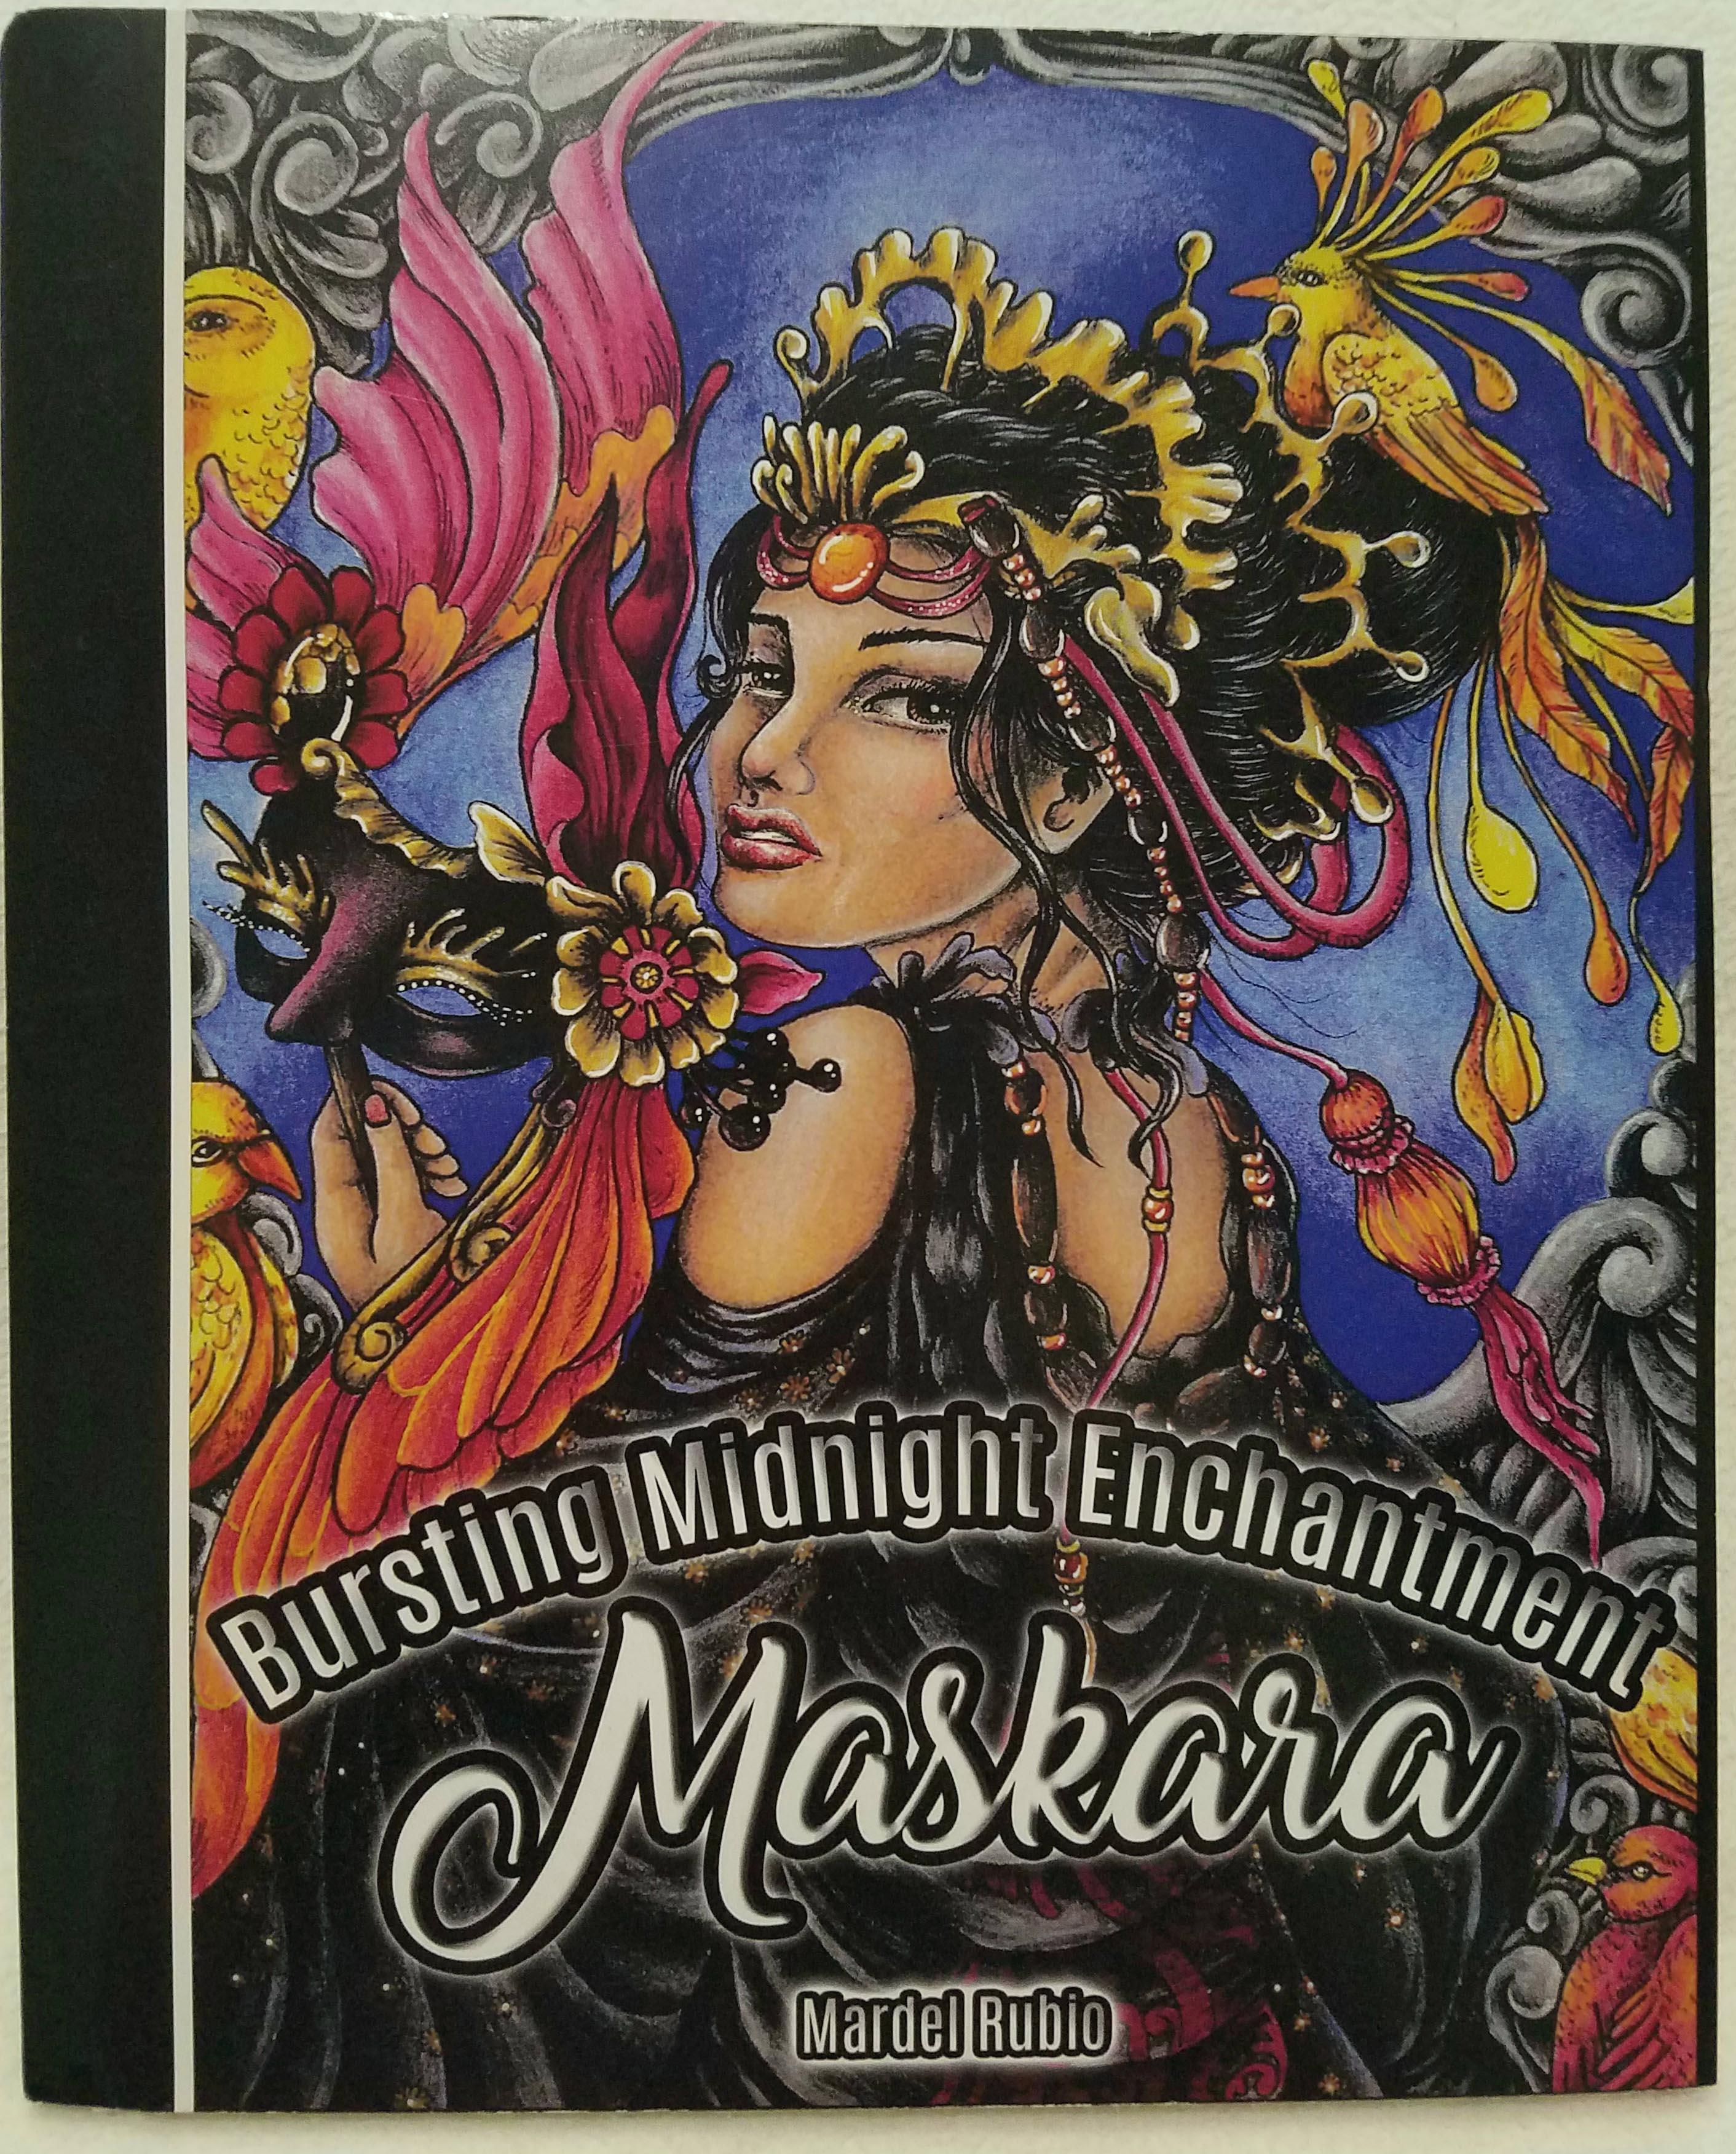 Maskara bursting midnight enchantment Dragon coloring book for adults midnight edition